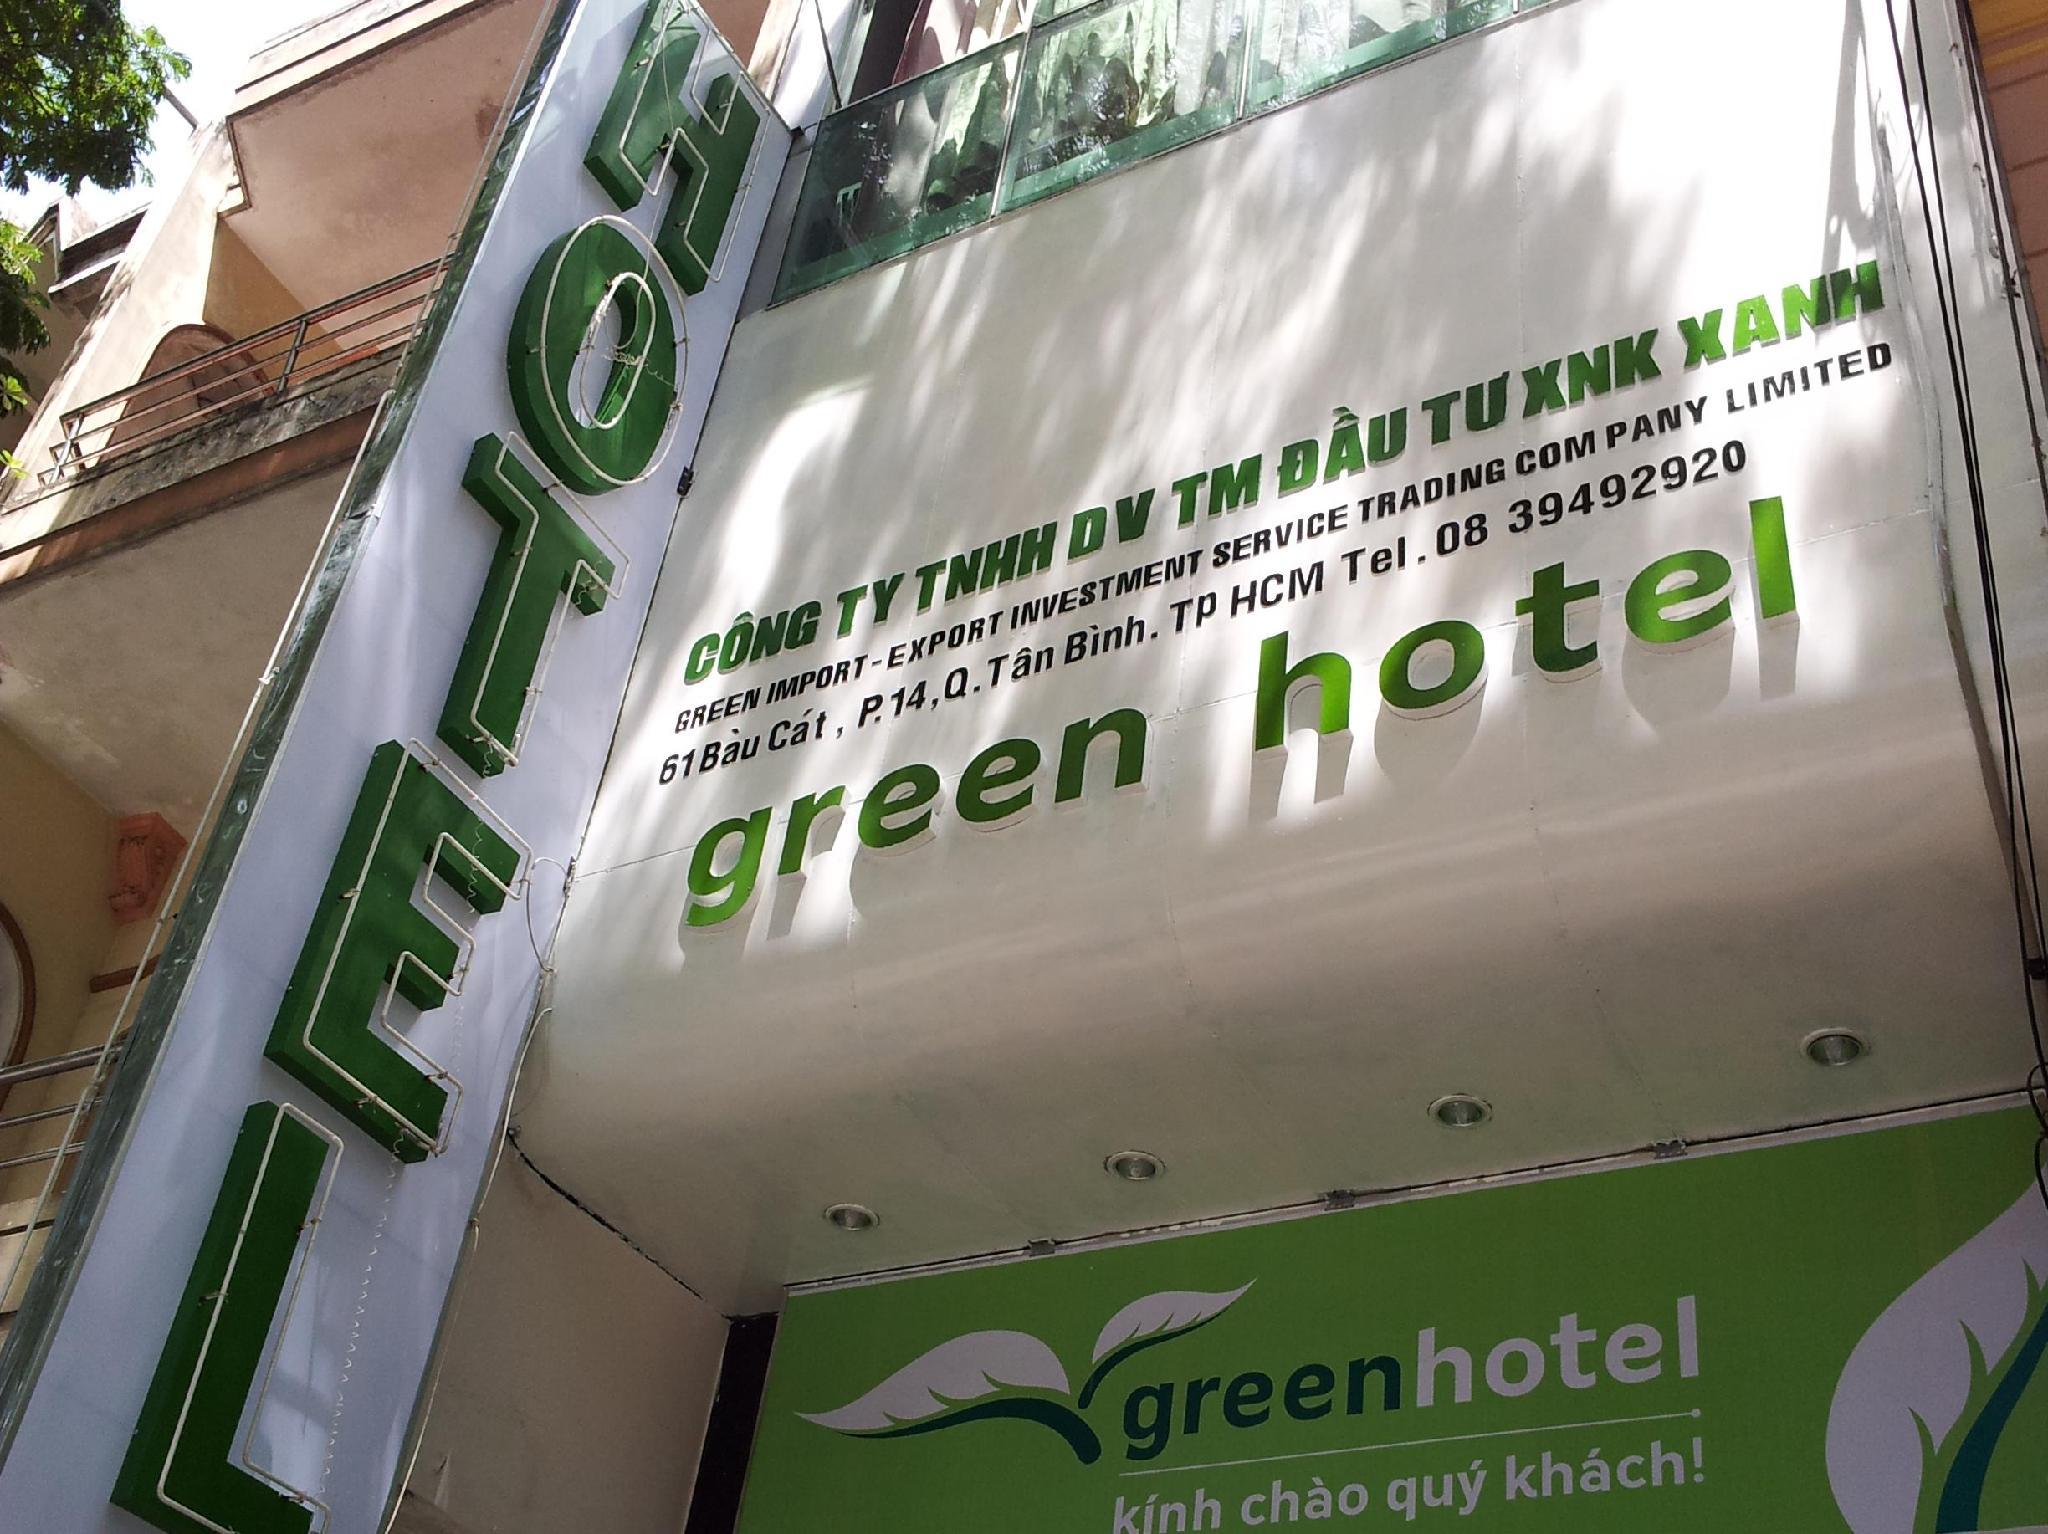 Green Hotel - Bau Cat Street